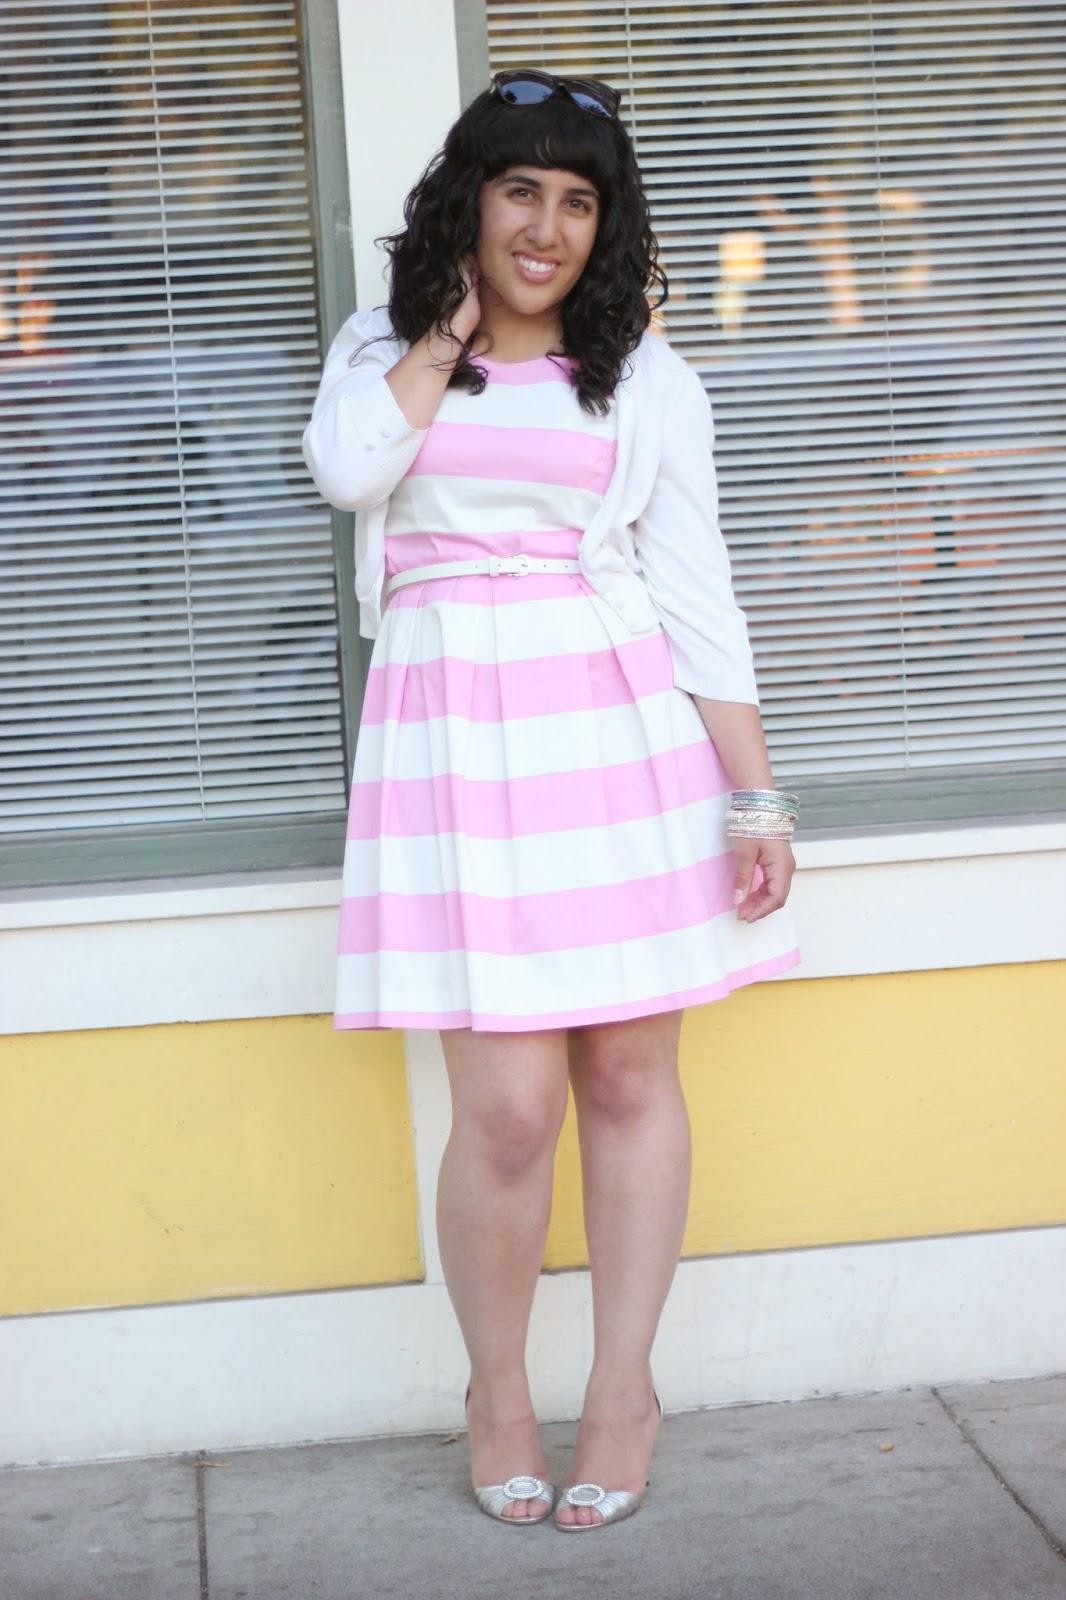 Bubblegum Pink Dress